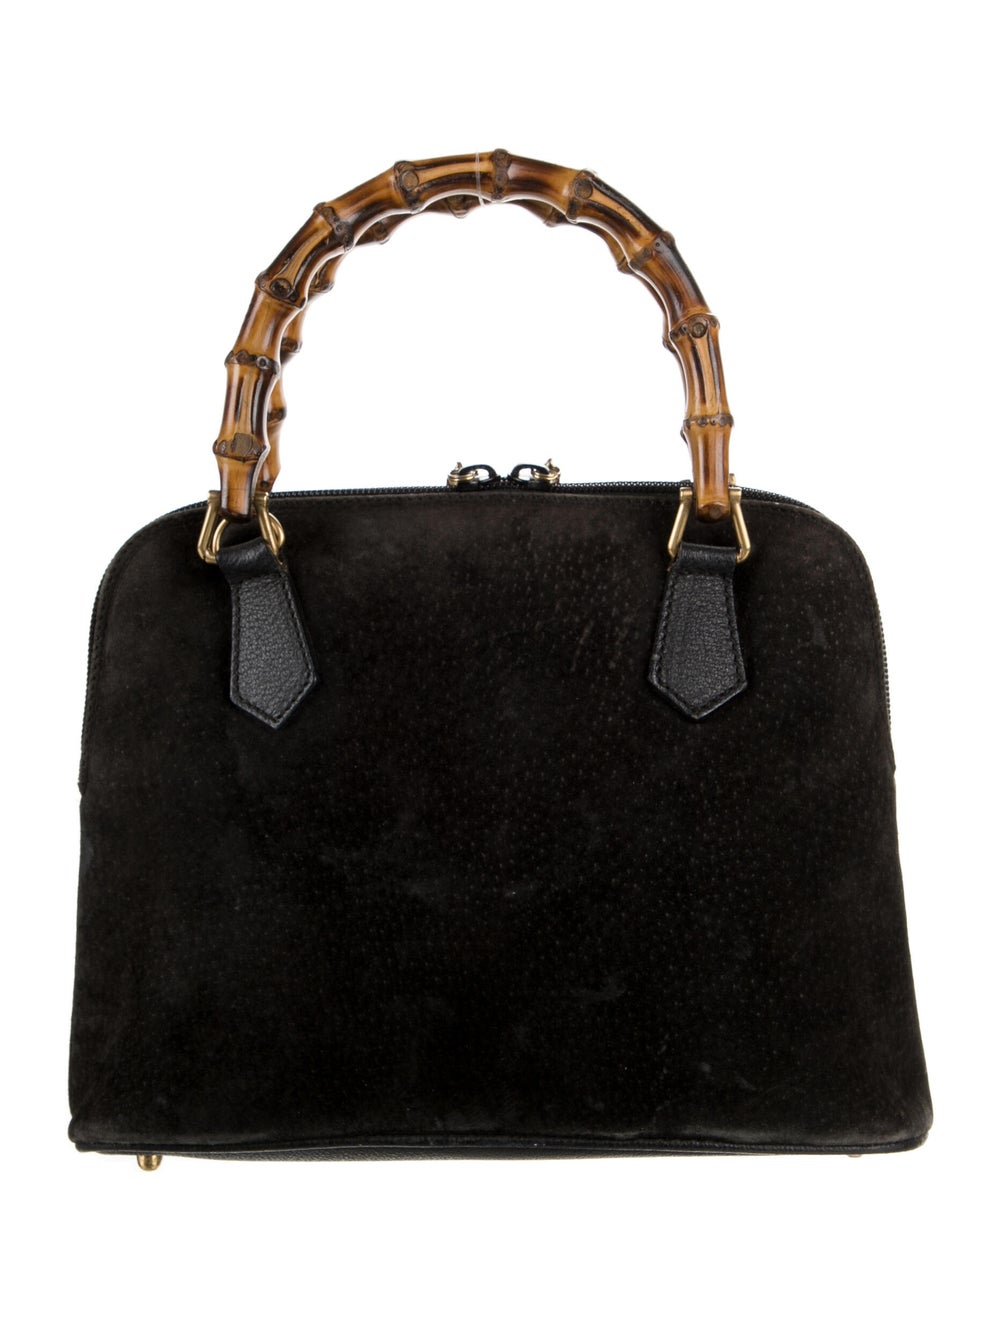 Gucci Mini Bamboo Handle Bag Brown - image 4